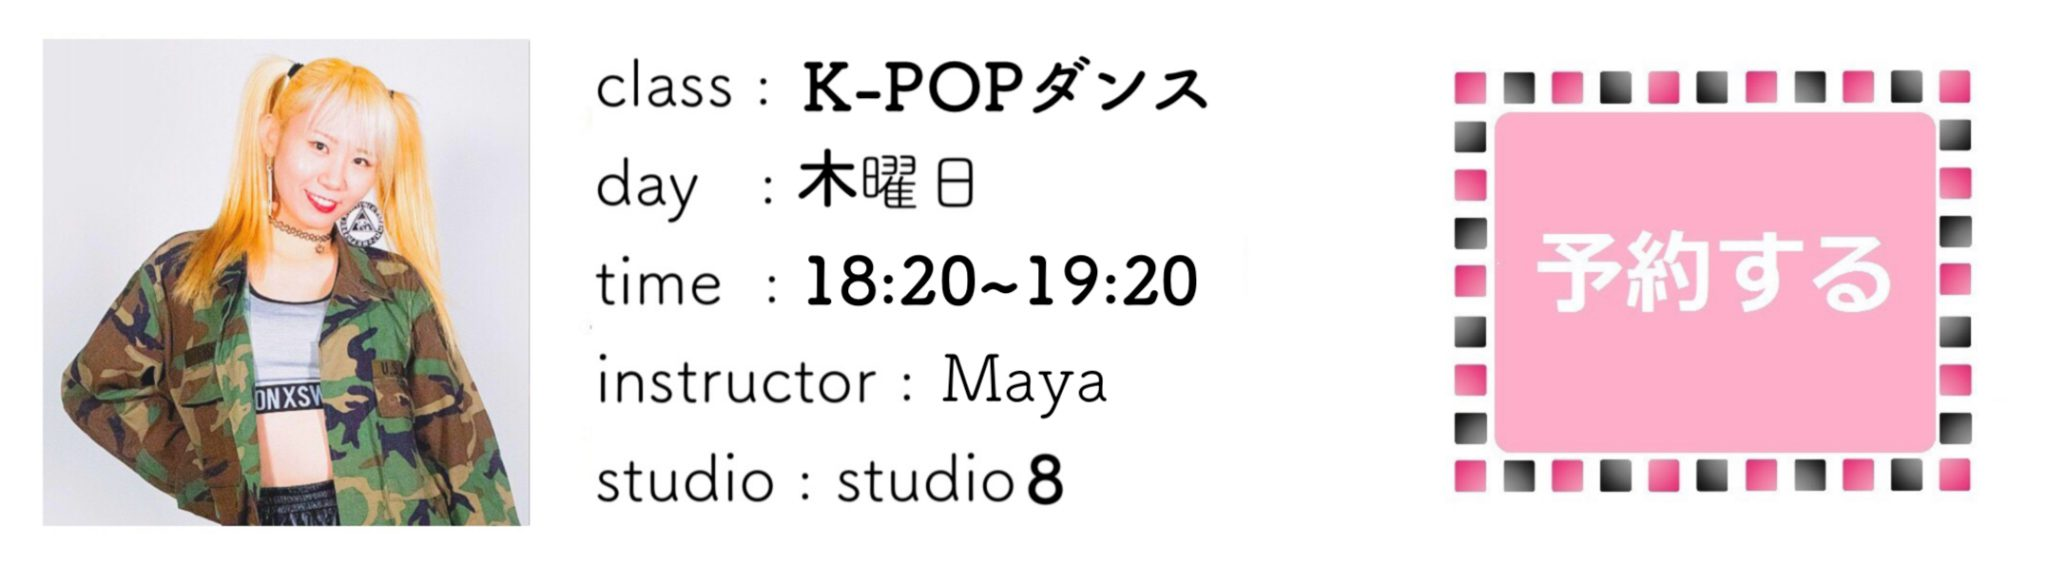 K-POPダンス(木曜日18:20) フリーパス予約